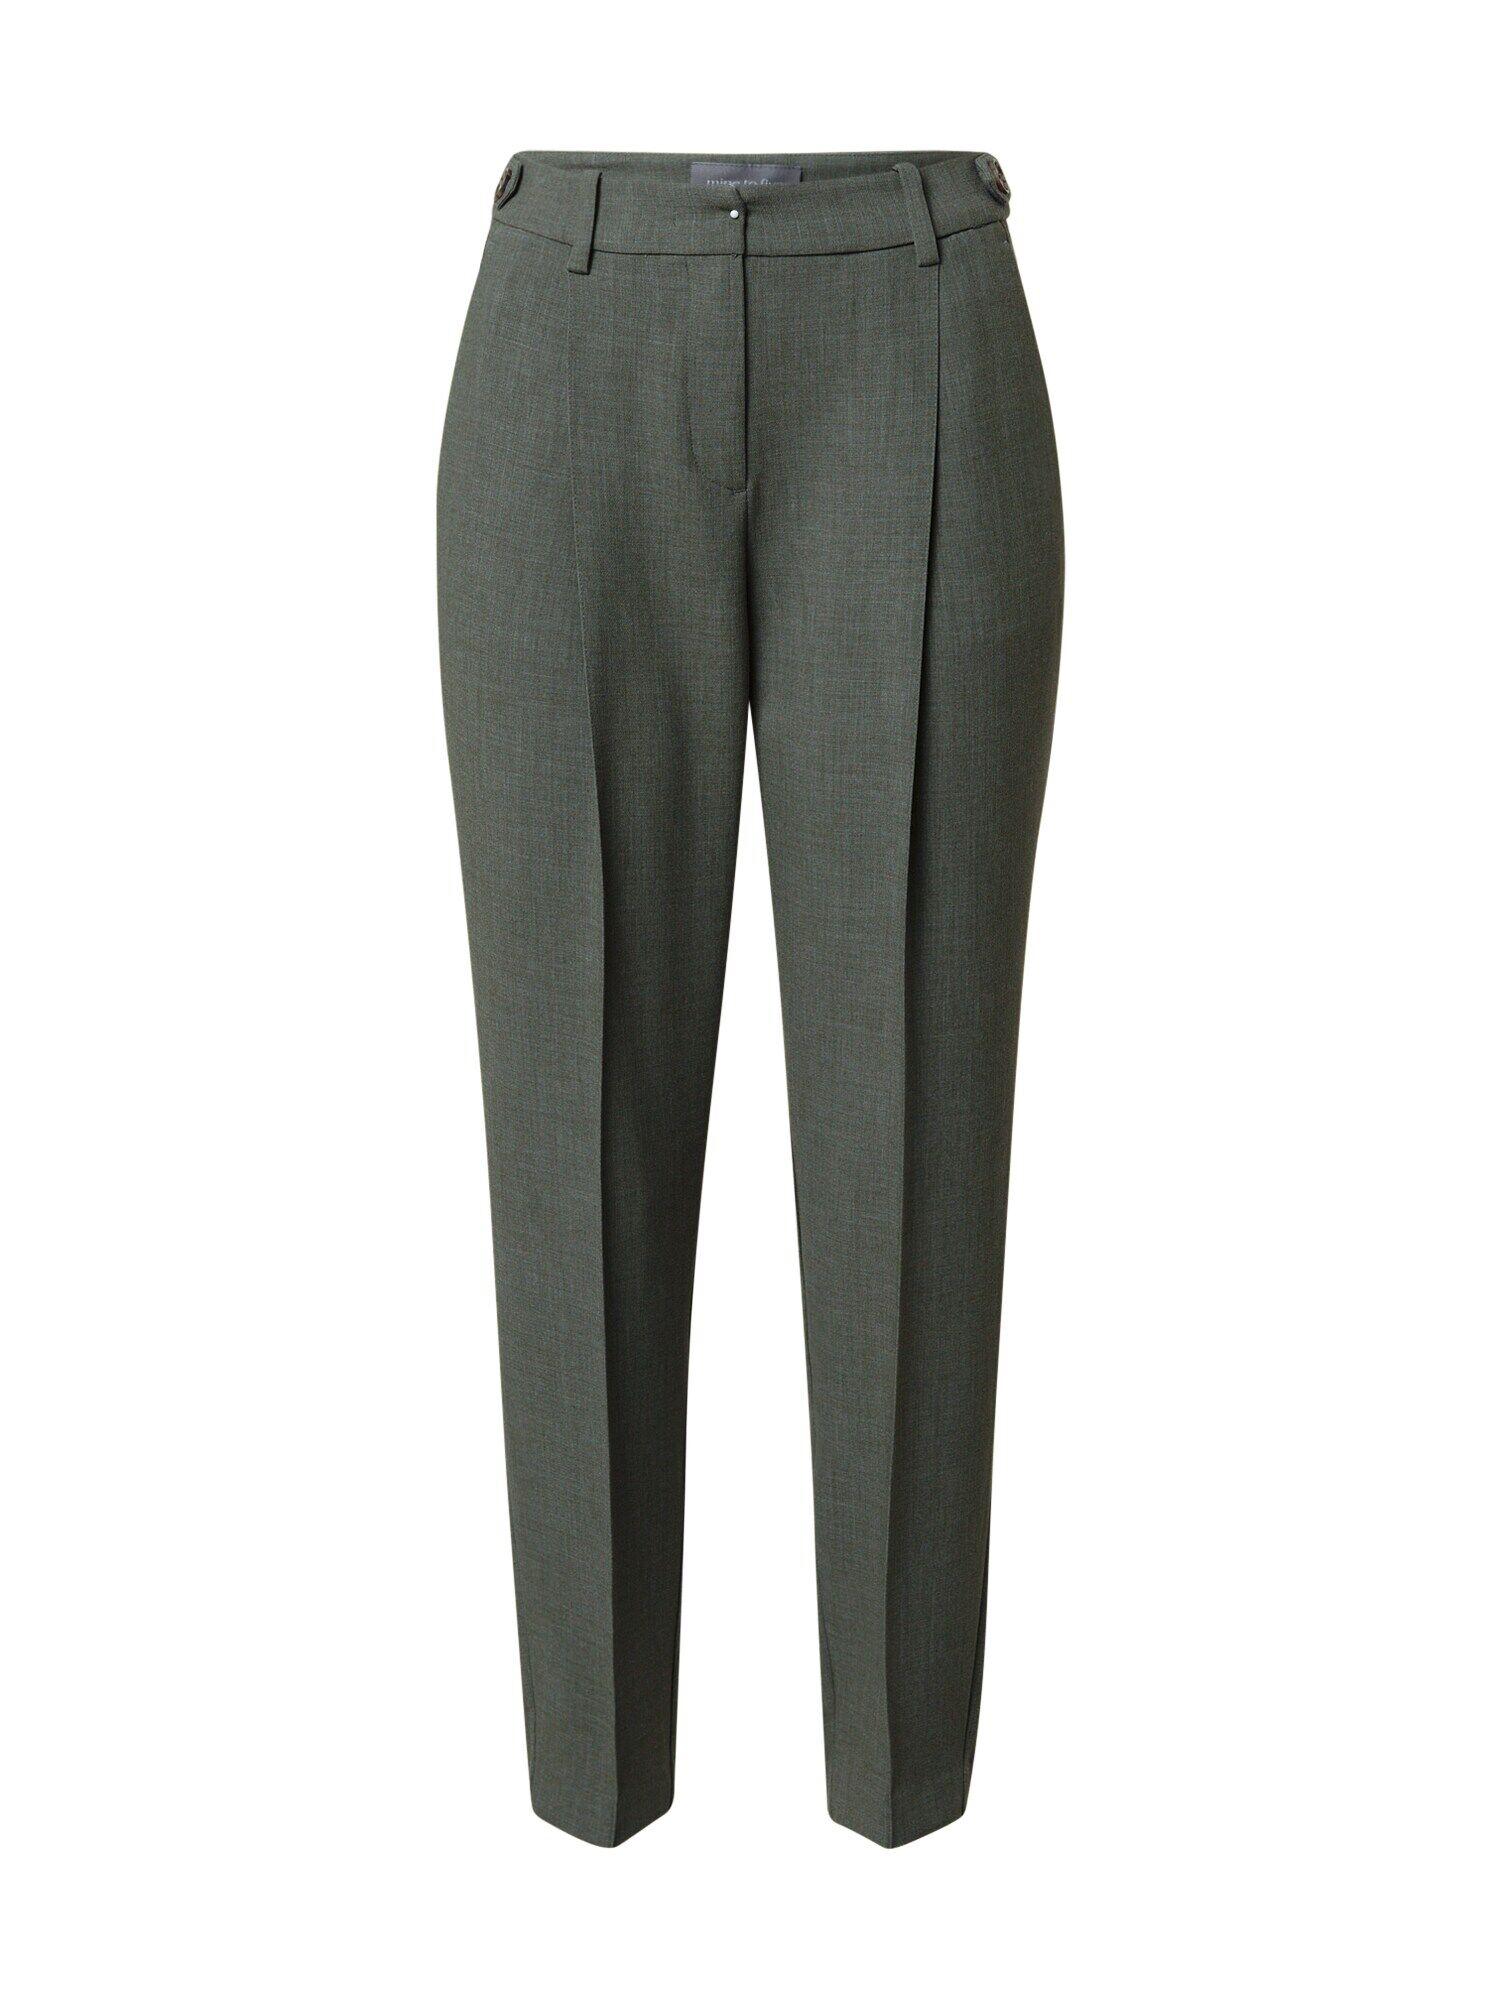 MINE TO FIVE Pantalon à pince  - Vert - Taille: 44 - female